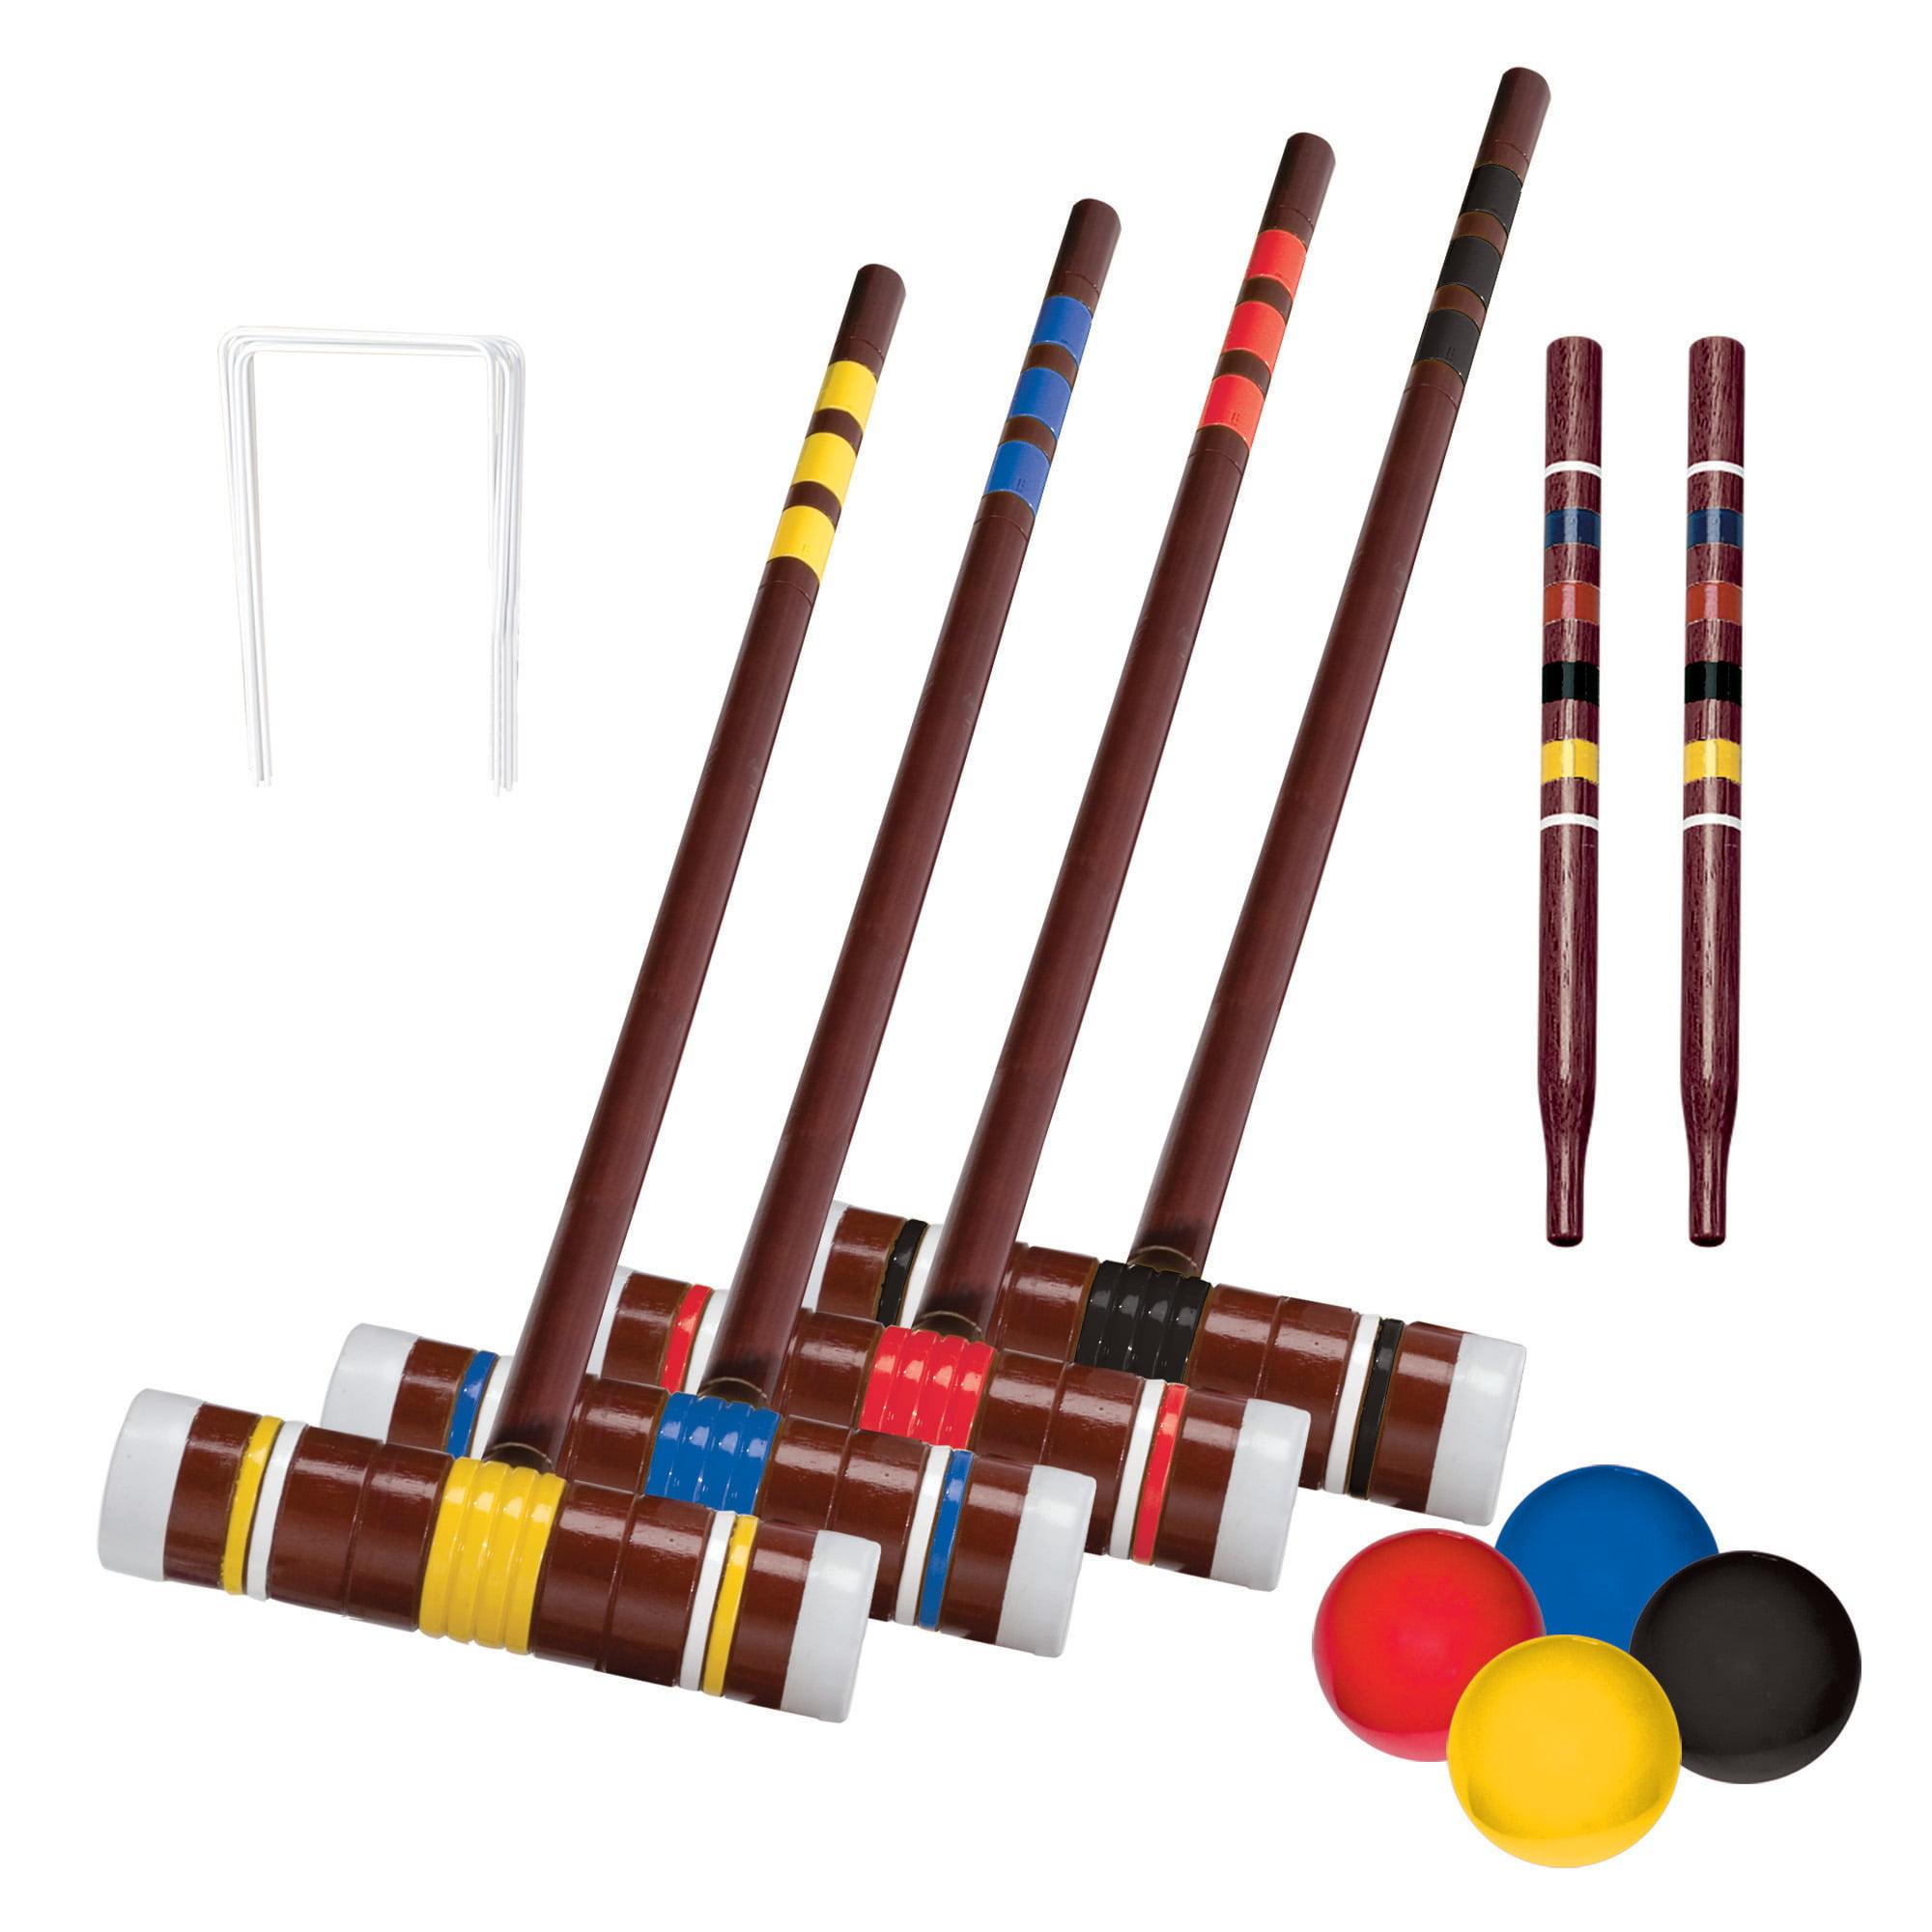 Franklin Sports Recreational 4-Player Croquet Set